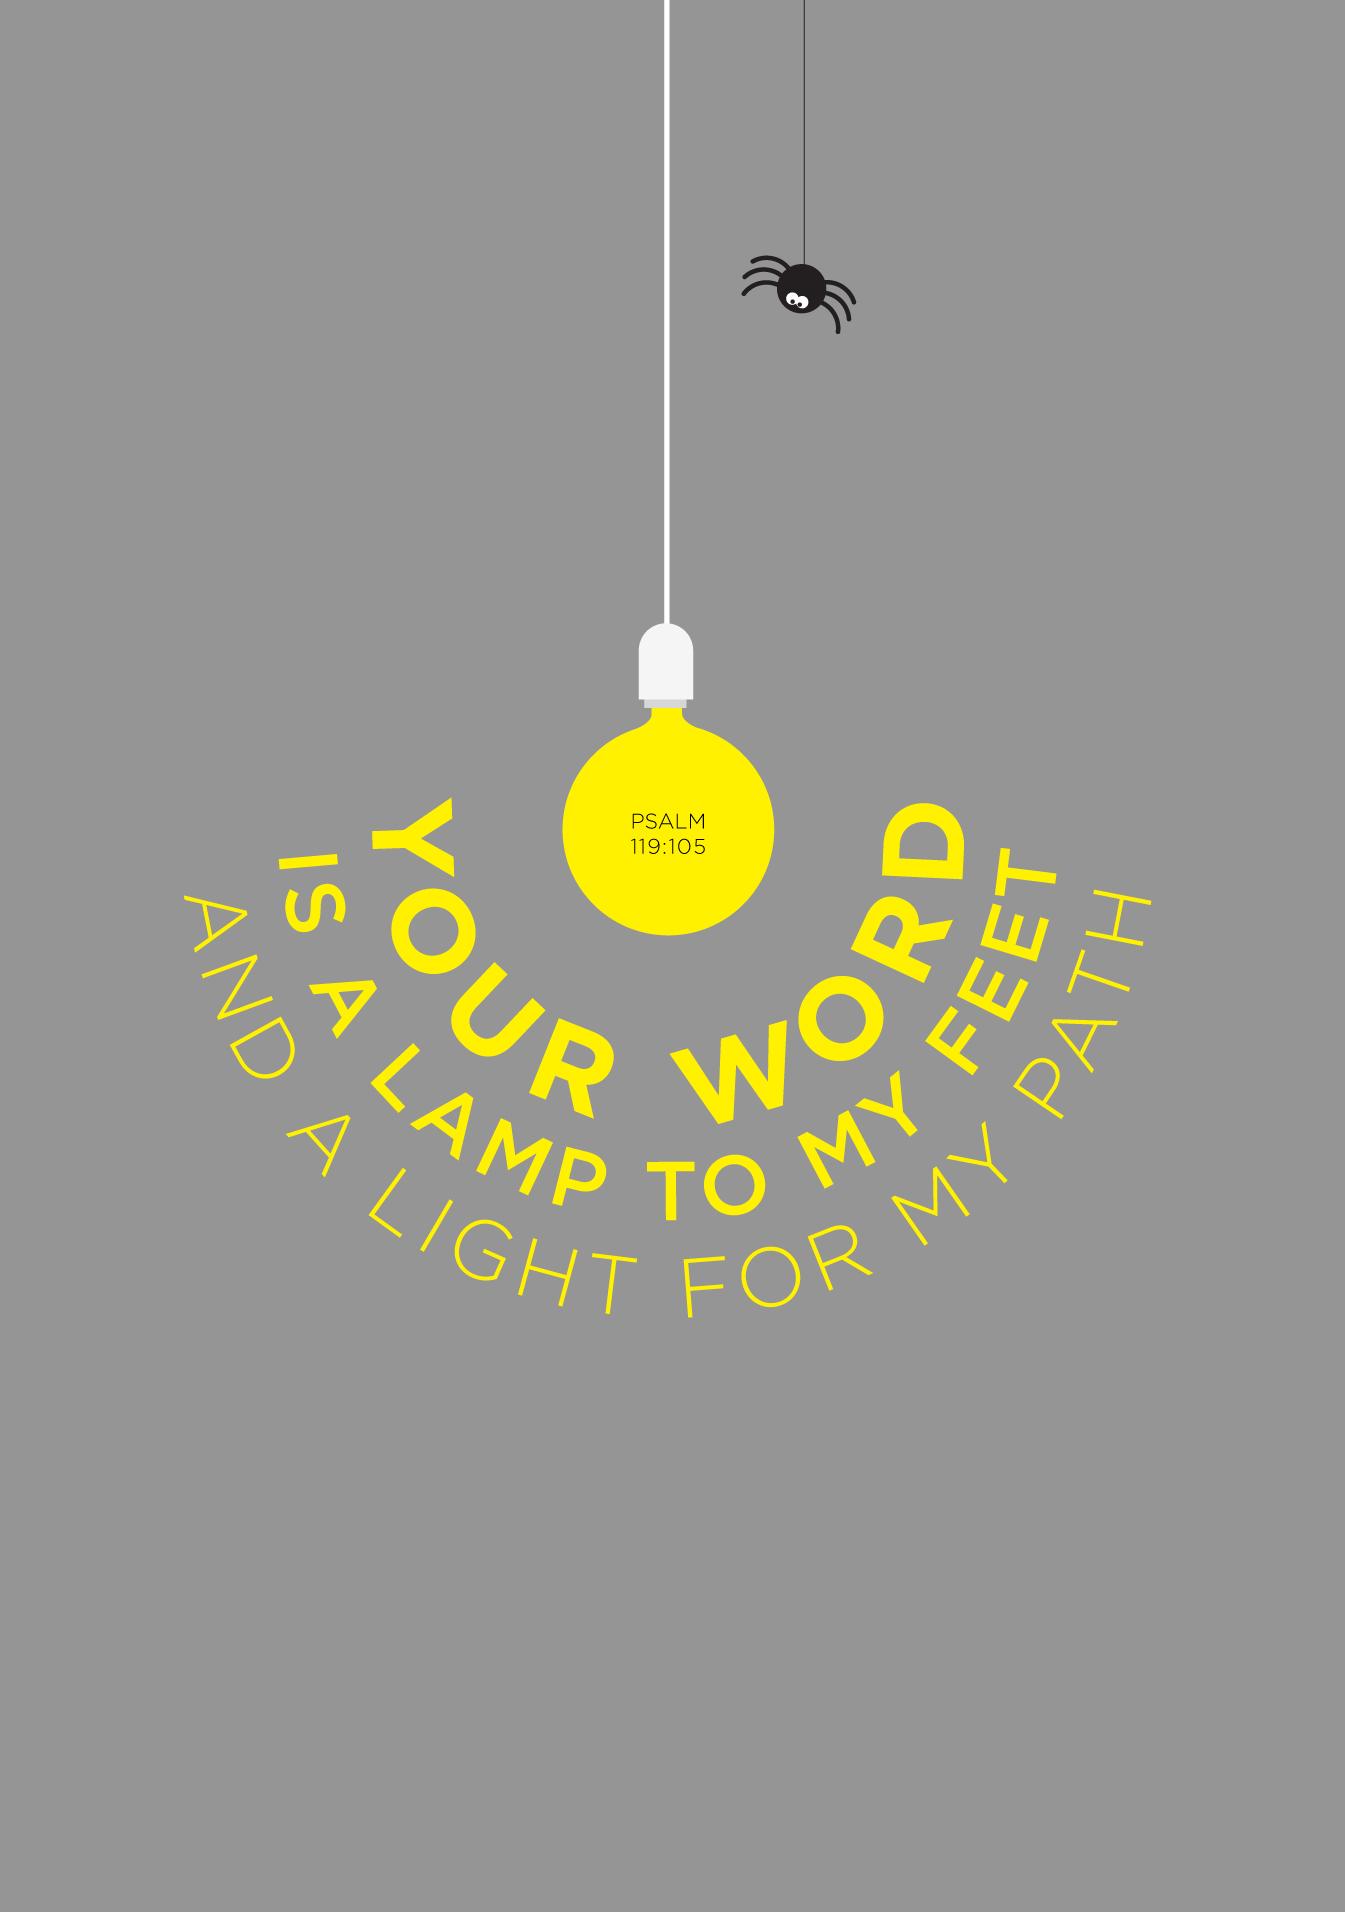 Lamp quote #1